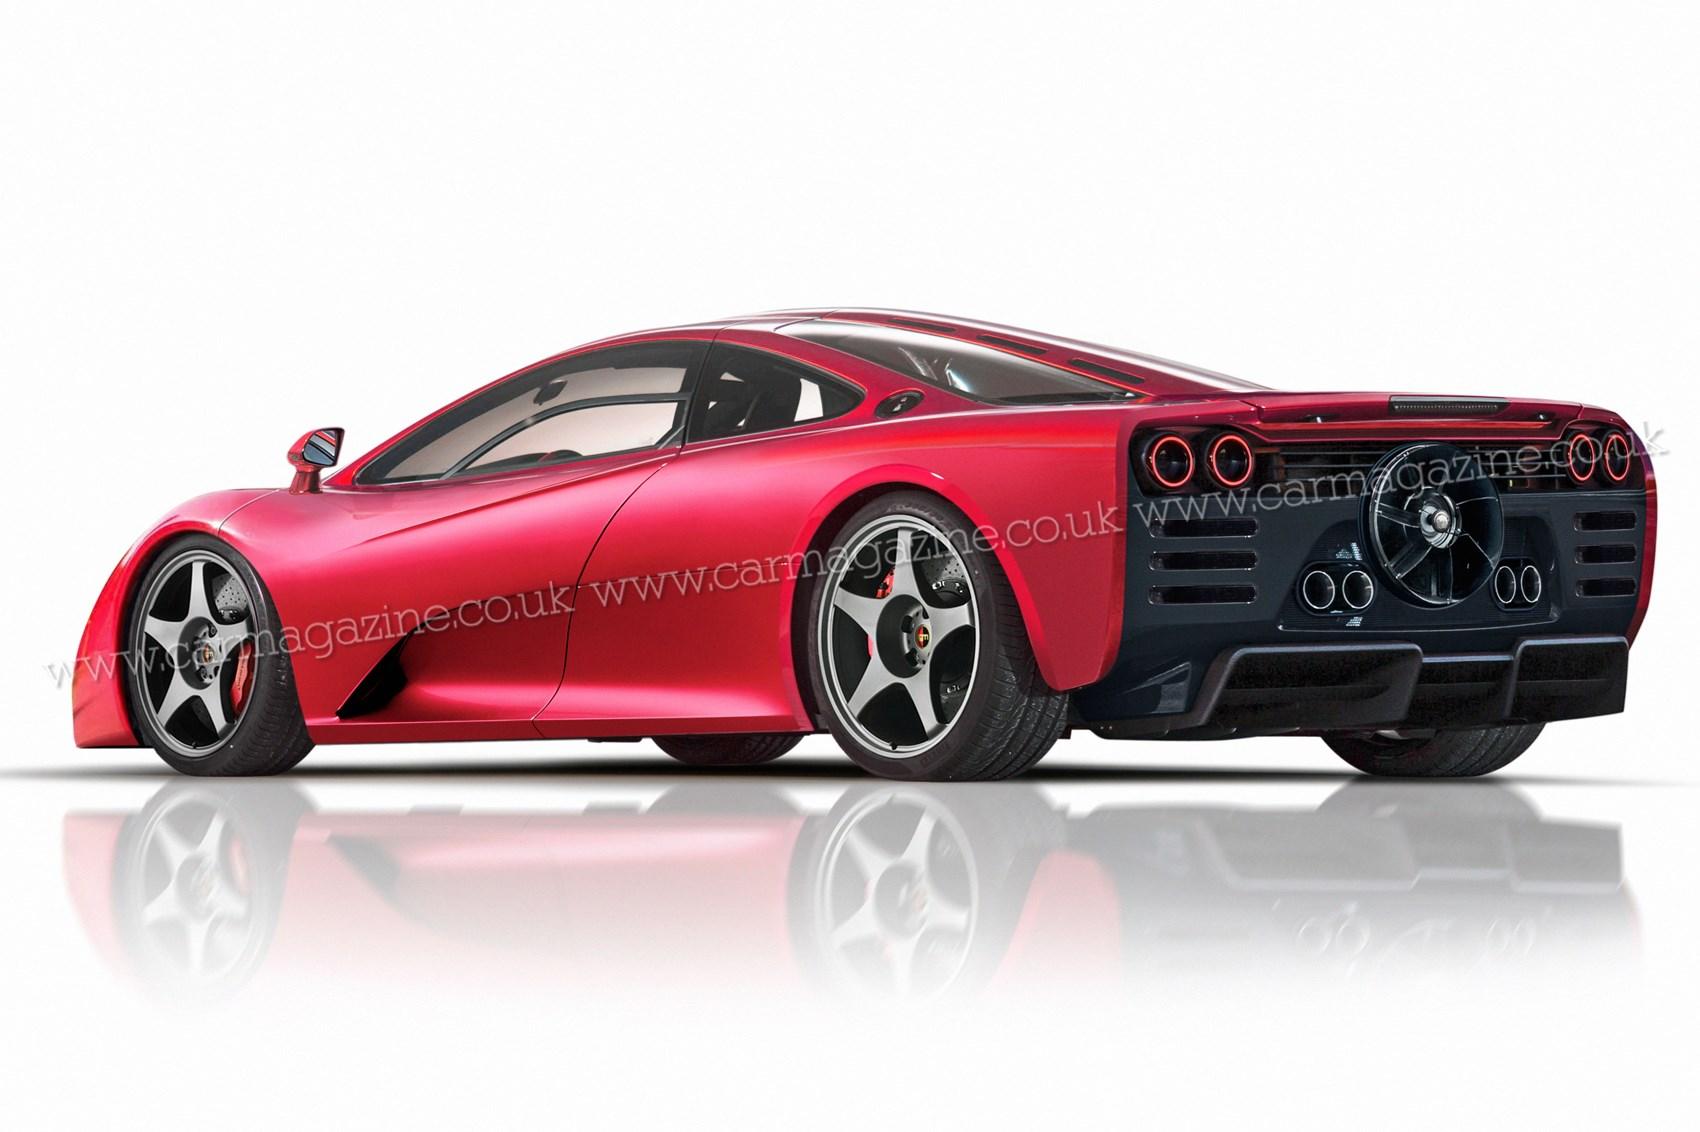 gordon murrays bhp kg mclaren  successor car magazine